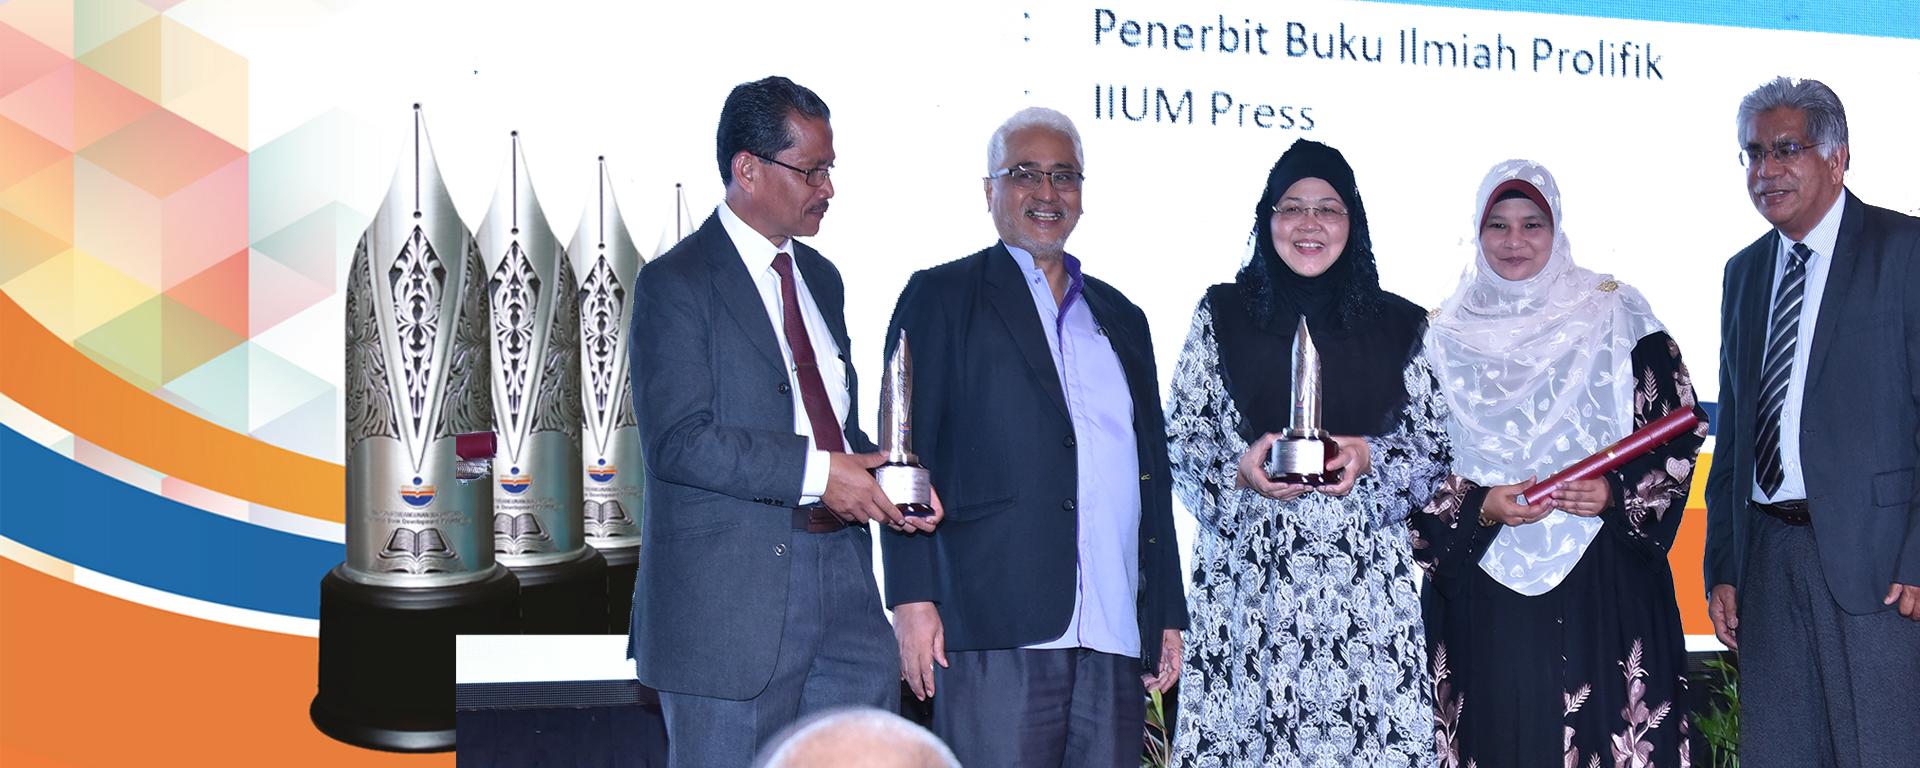 IIUM Grab 3 Awards in National Book Awards 2018